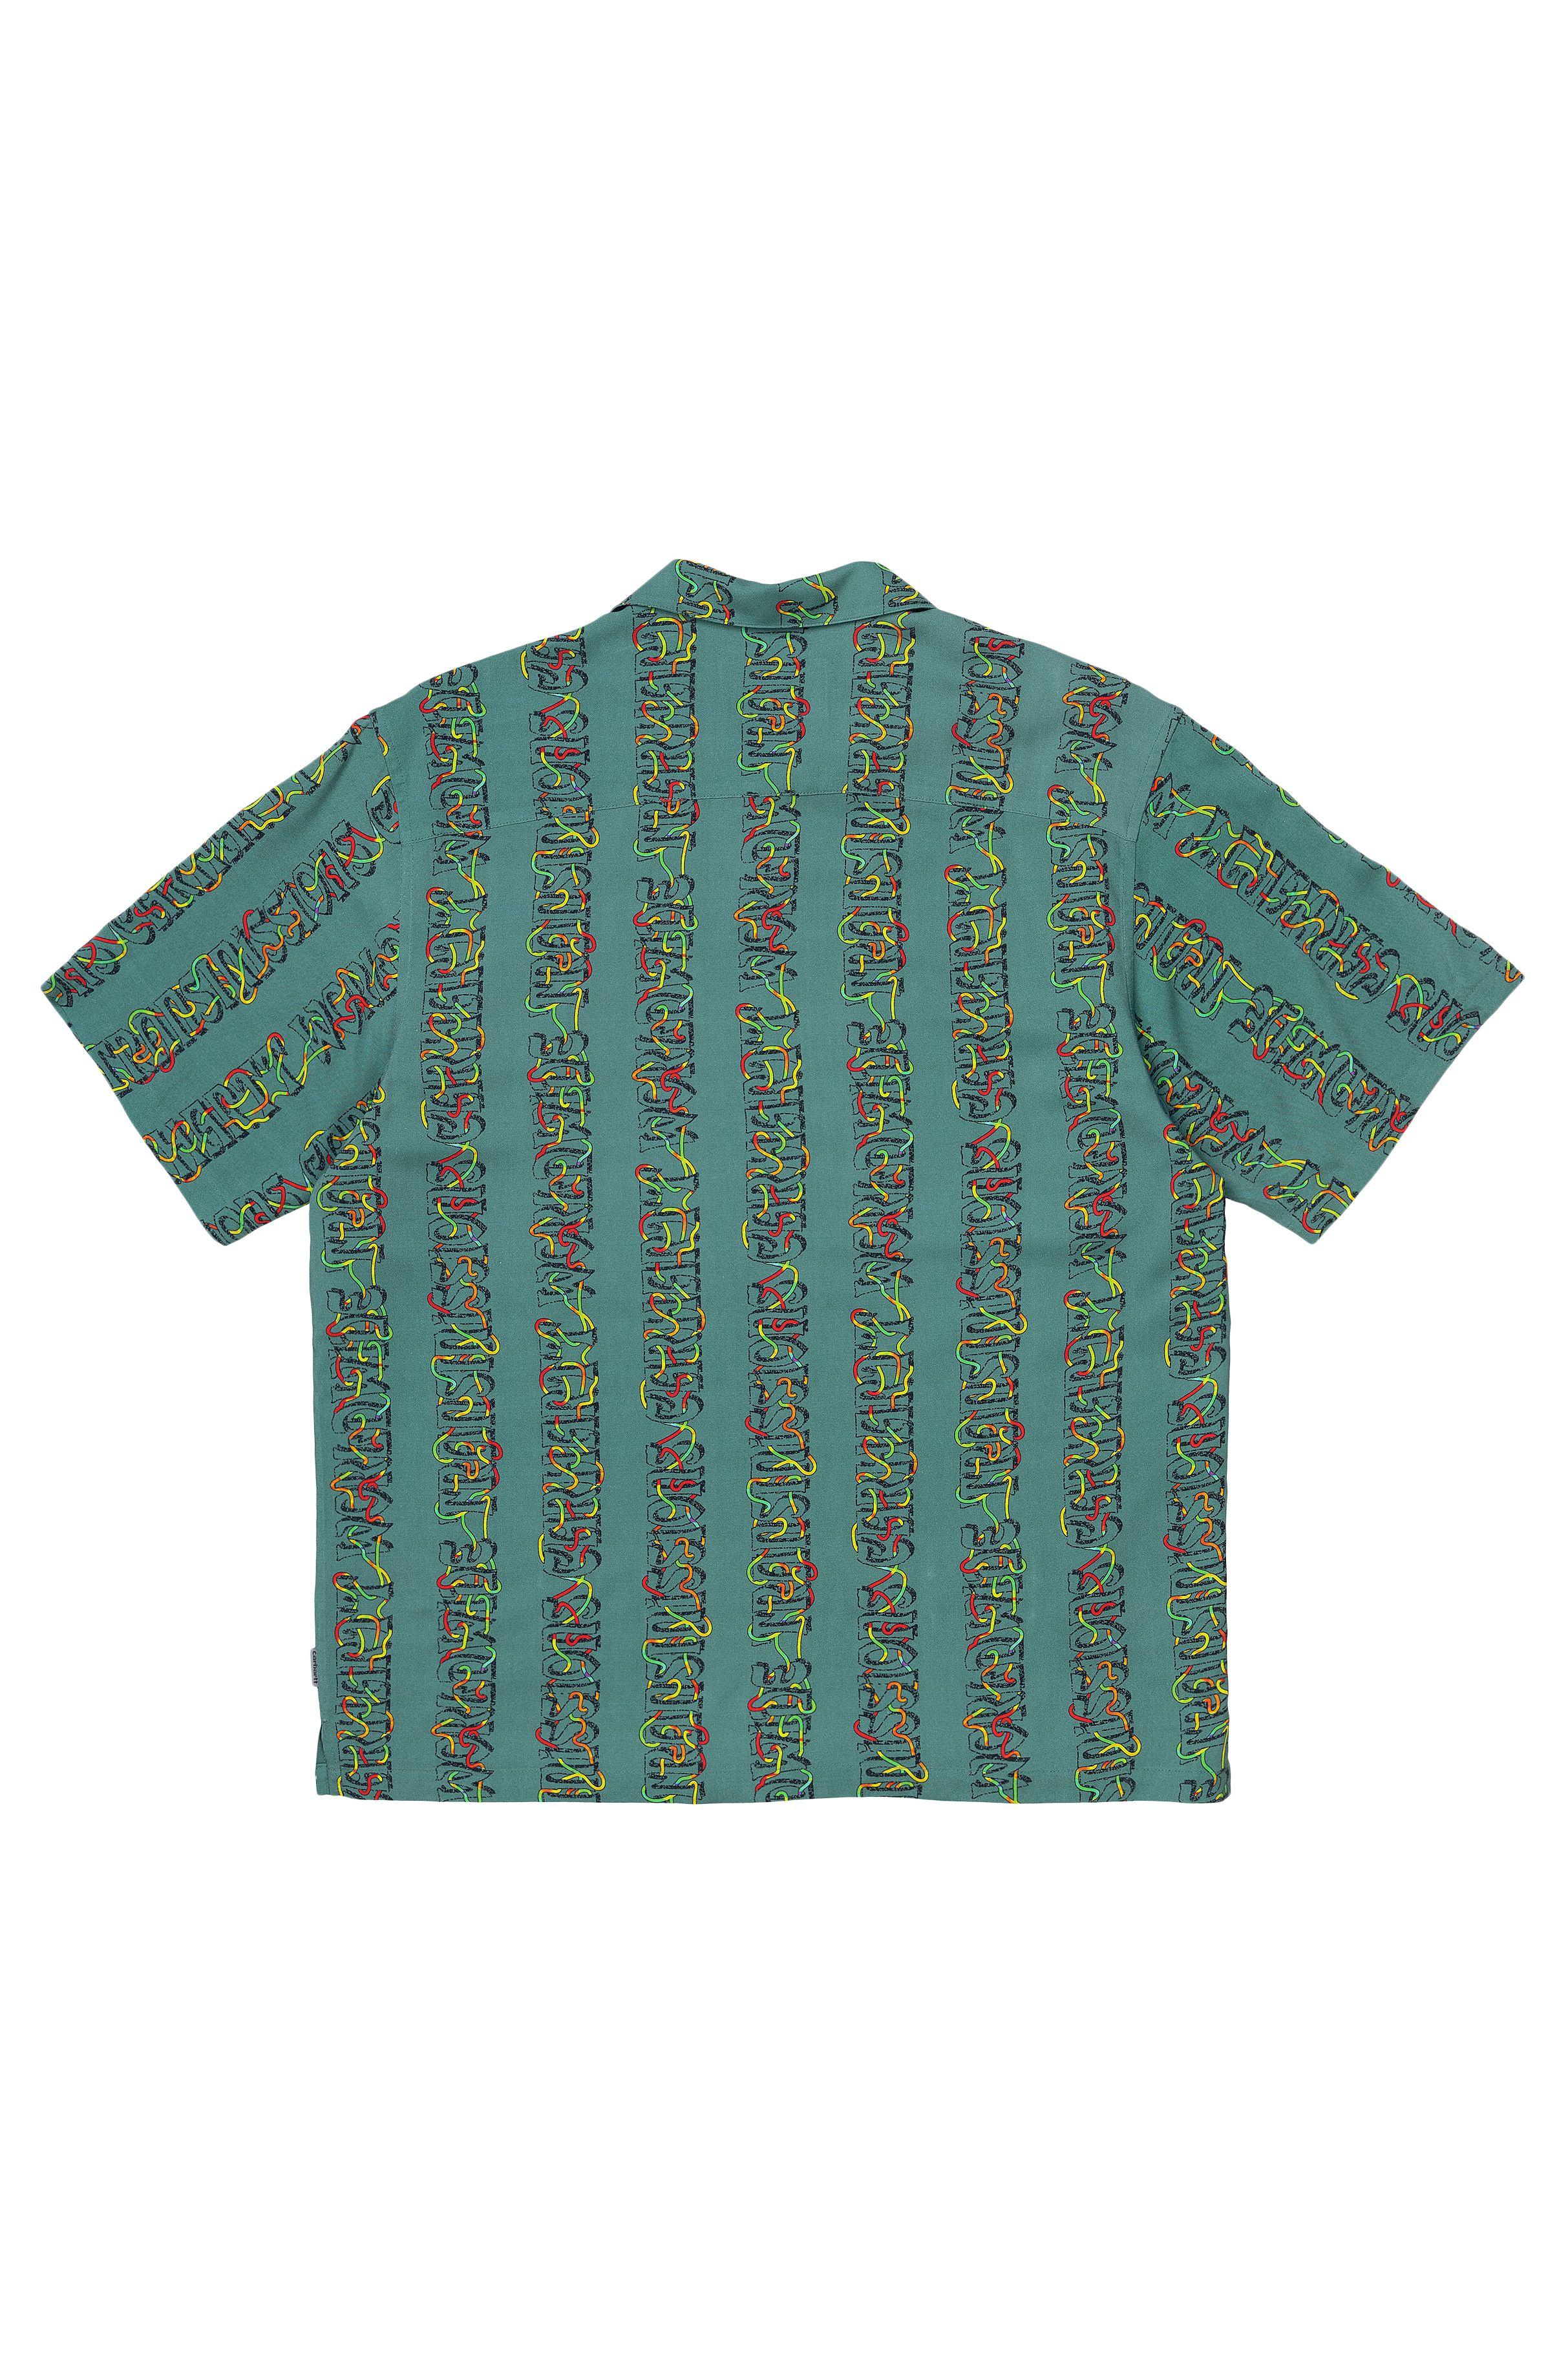 Camisa Carhartt WIP S/S TRANSMISSION SHIRT Transmission Print, Hydro